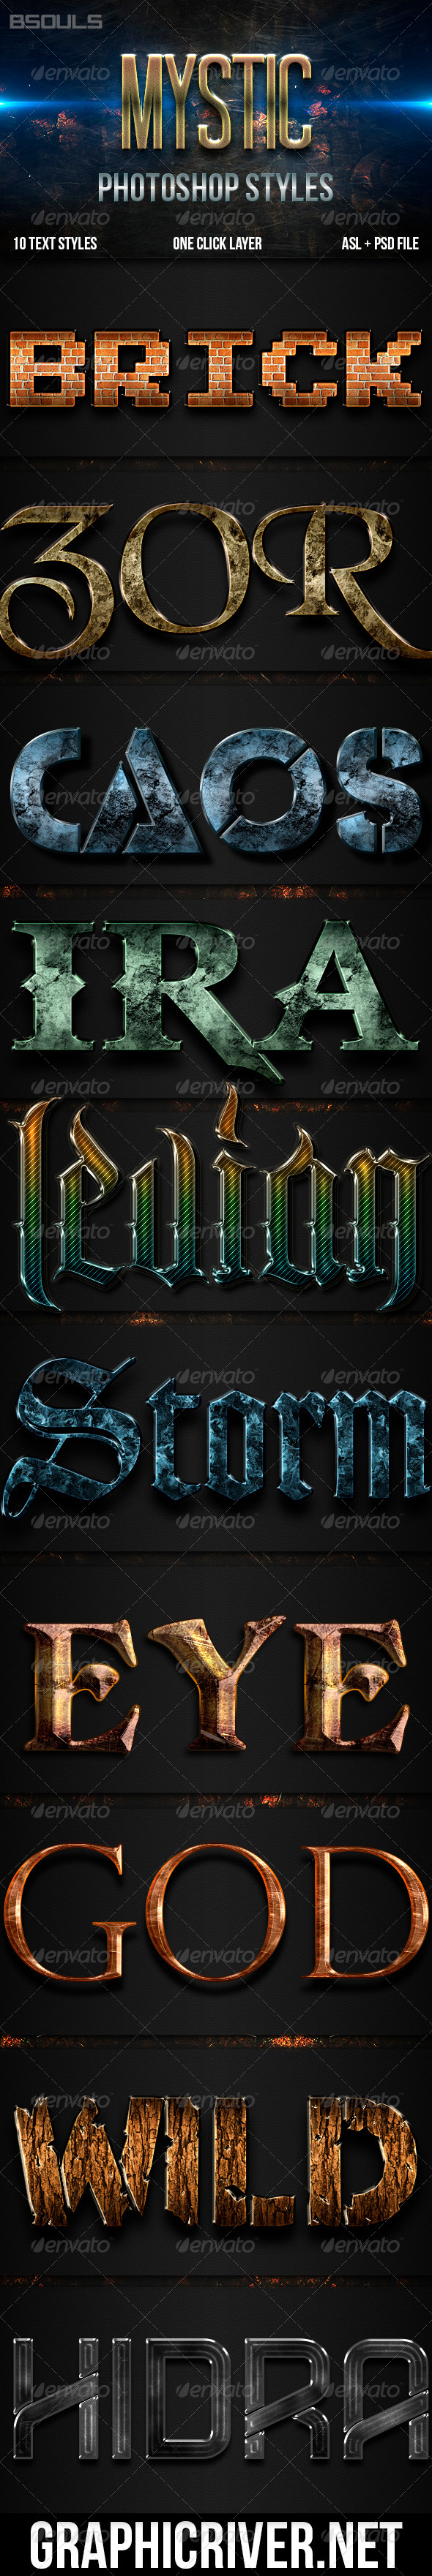 GraphicRiver Mistyc Photoshop Styles 5815378